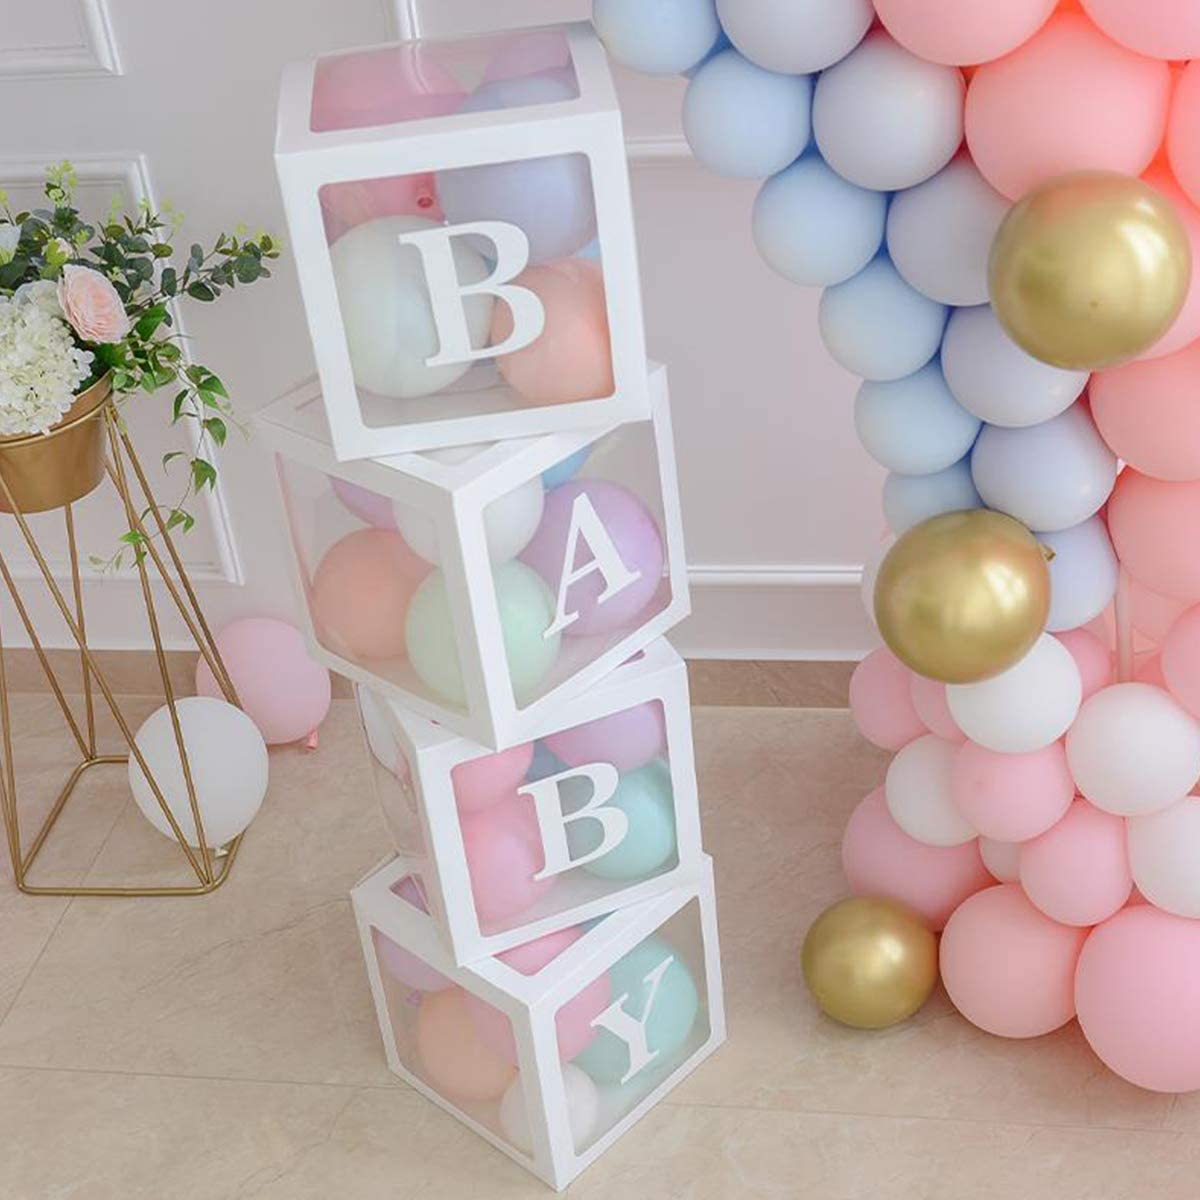 VINFUTUR 4pcs Baby Shower Boxes DIY Transparent Baby Box Decorations Kit with Ba